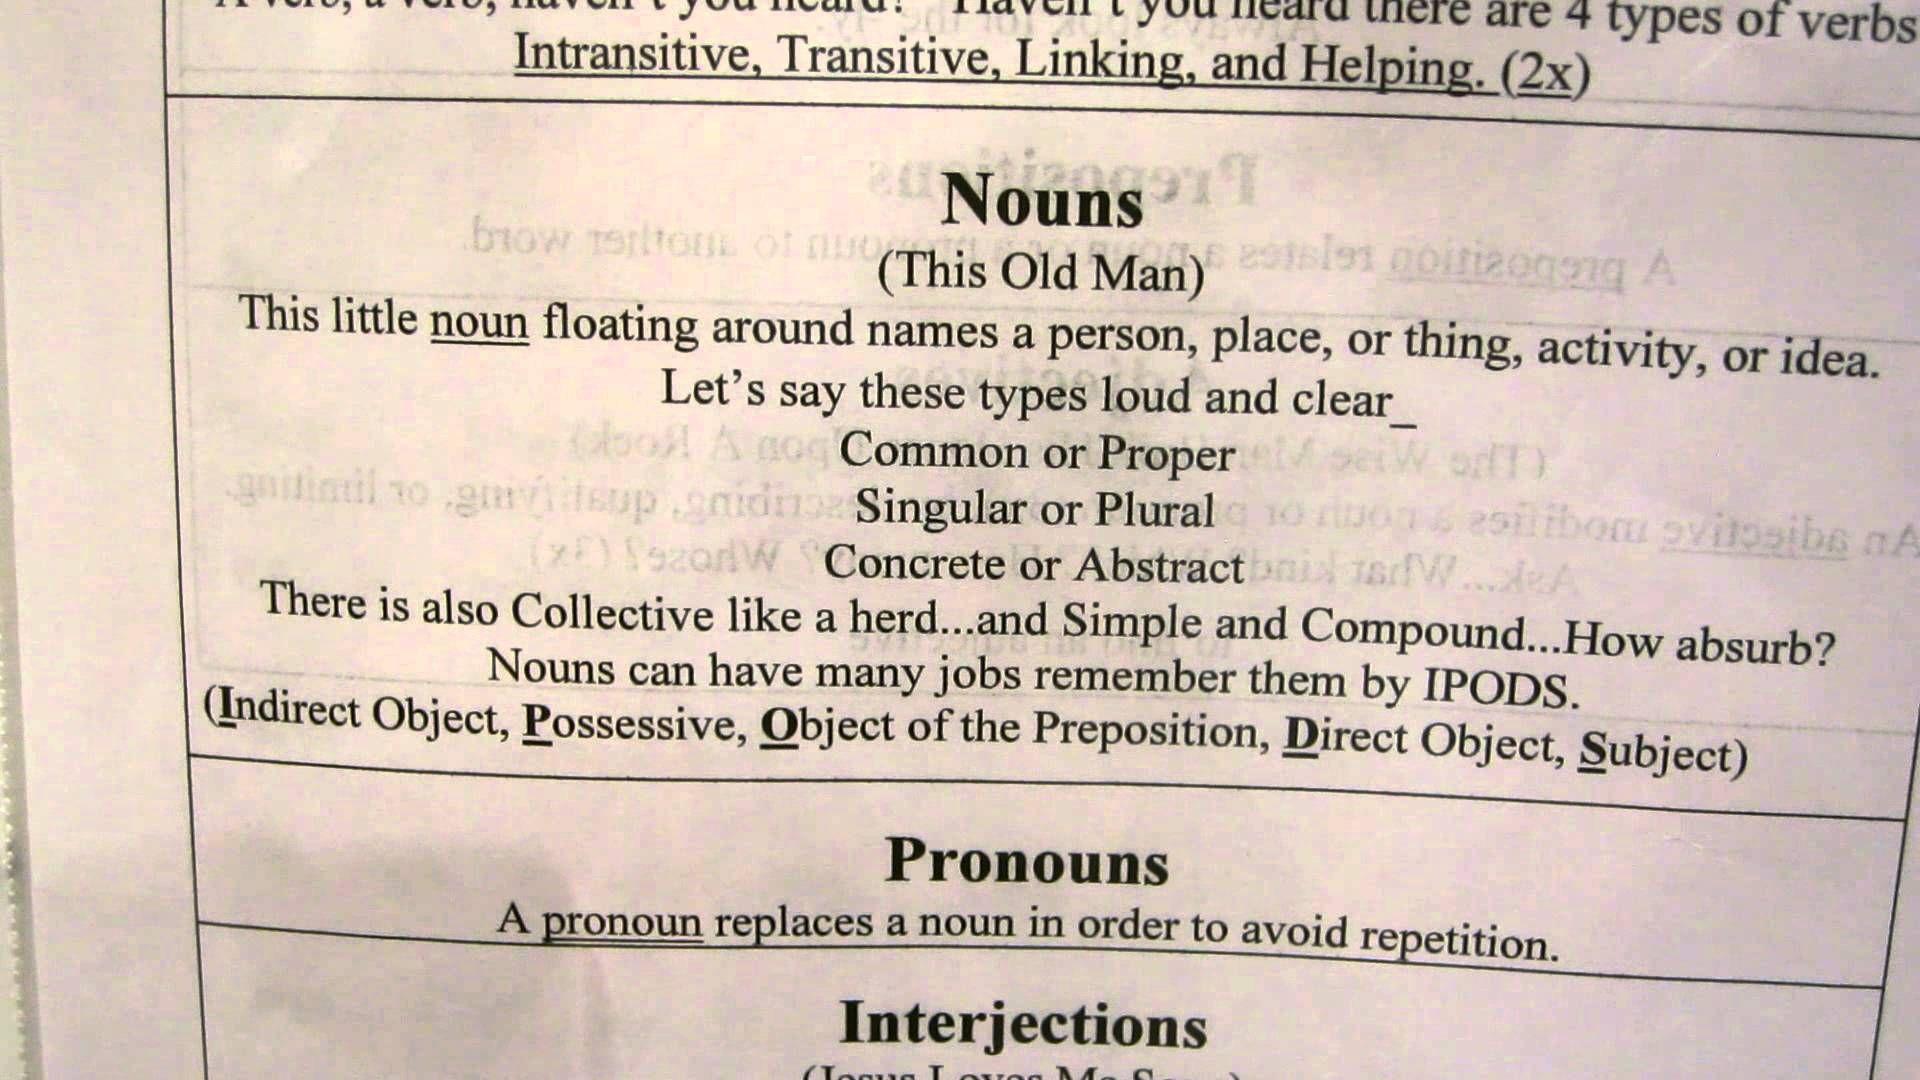 Essential Grammar Noun Song Classical Conversations Playlist Classical Conversations Essentials Noun Song Classical Conversations